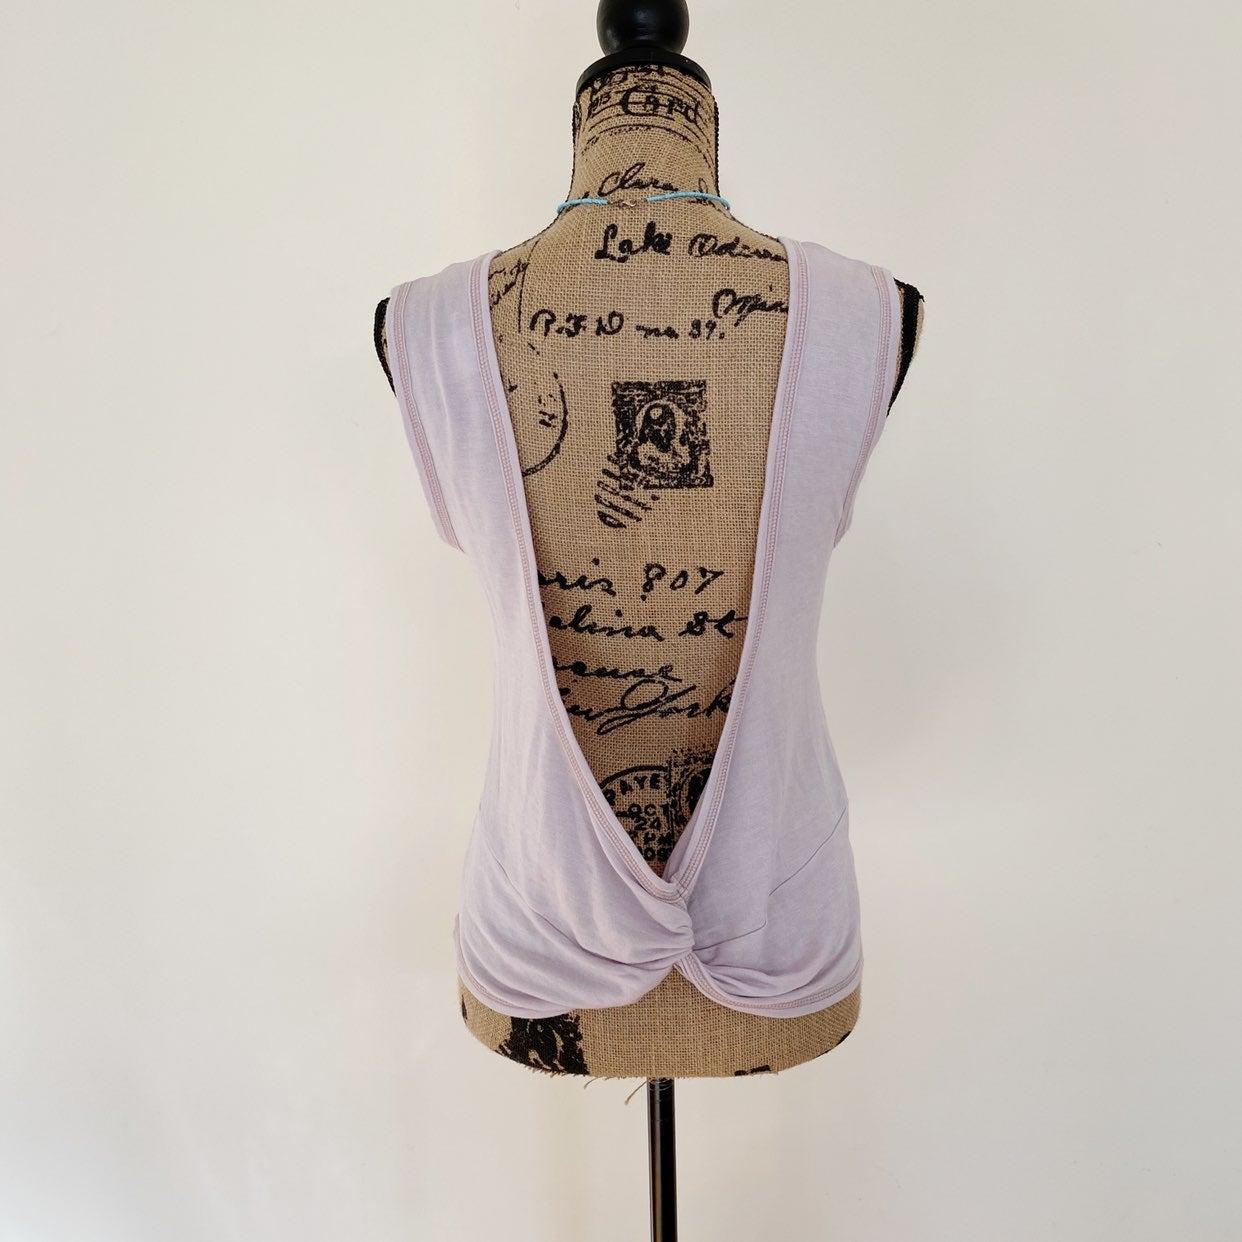 Tresics sleeveless open back knot top